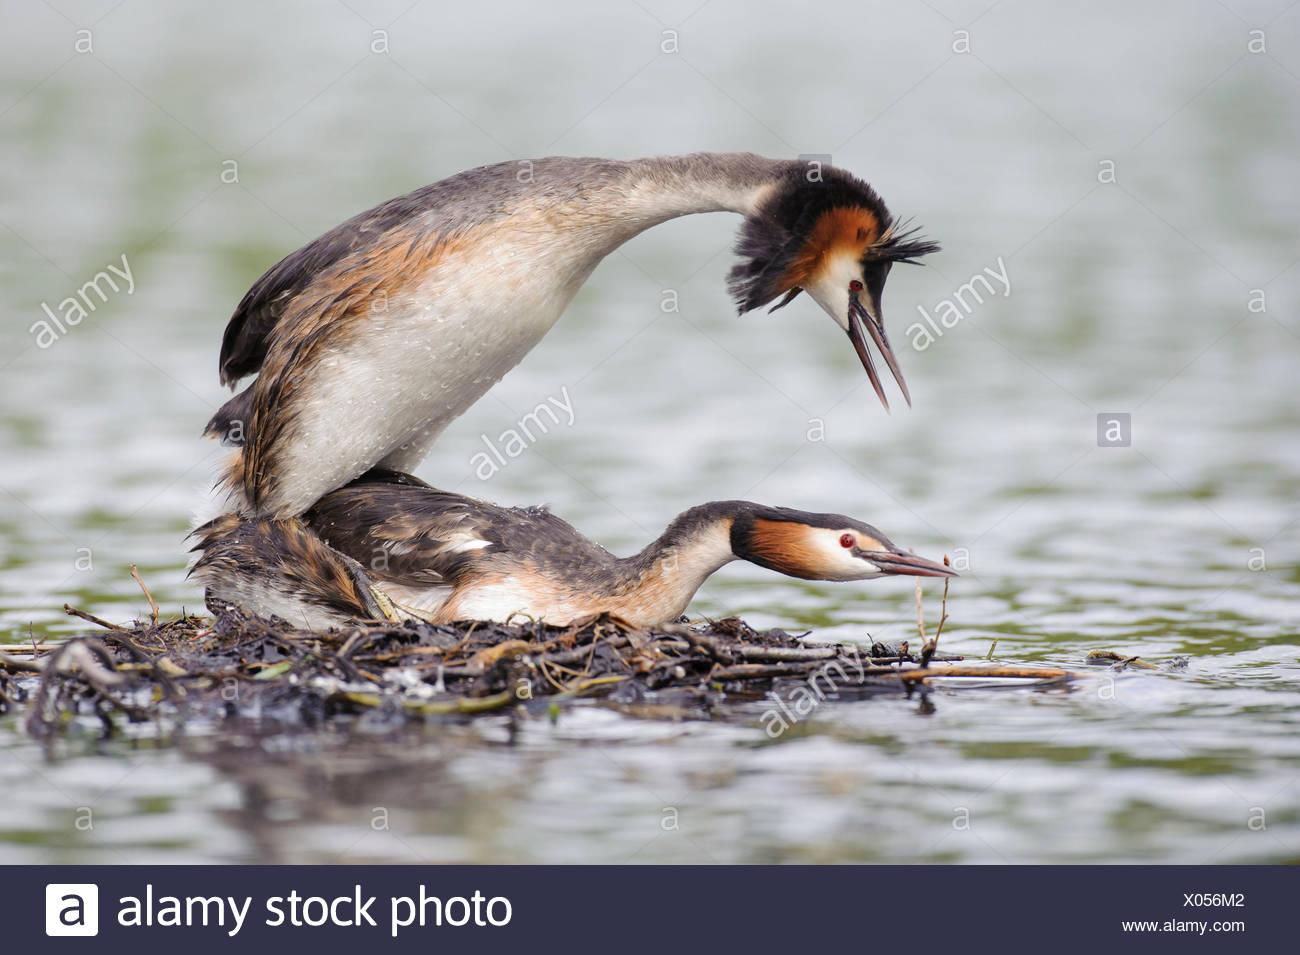 Great Crested Grebes, pair, Lower Saxony, Germany / (Podiceps cristatus)Haubentaucher, Paar, kopulierend, Niedersachsen, Deutschland / (Podiceps cristatus) - Stock Image